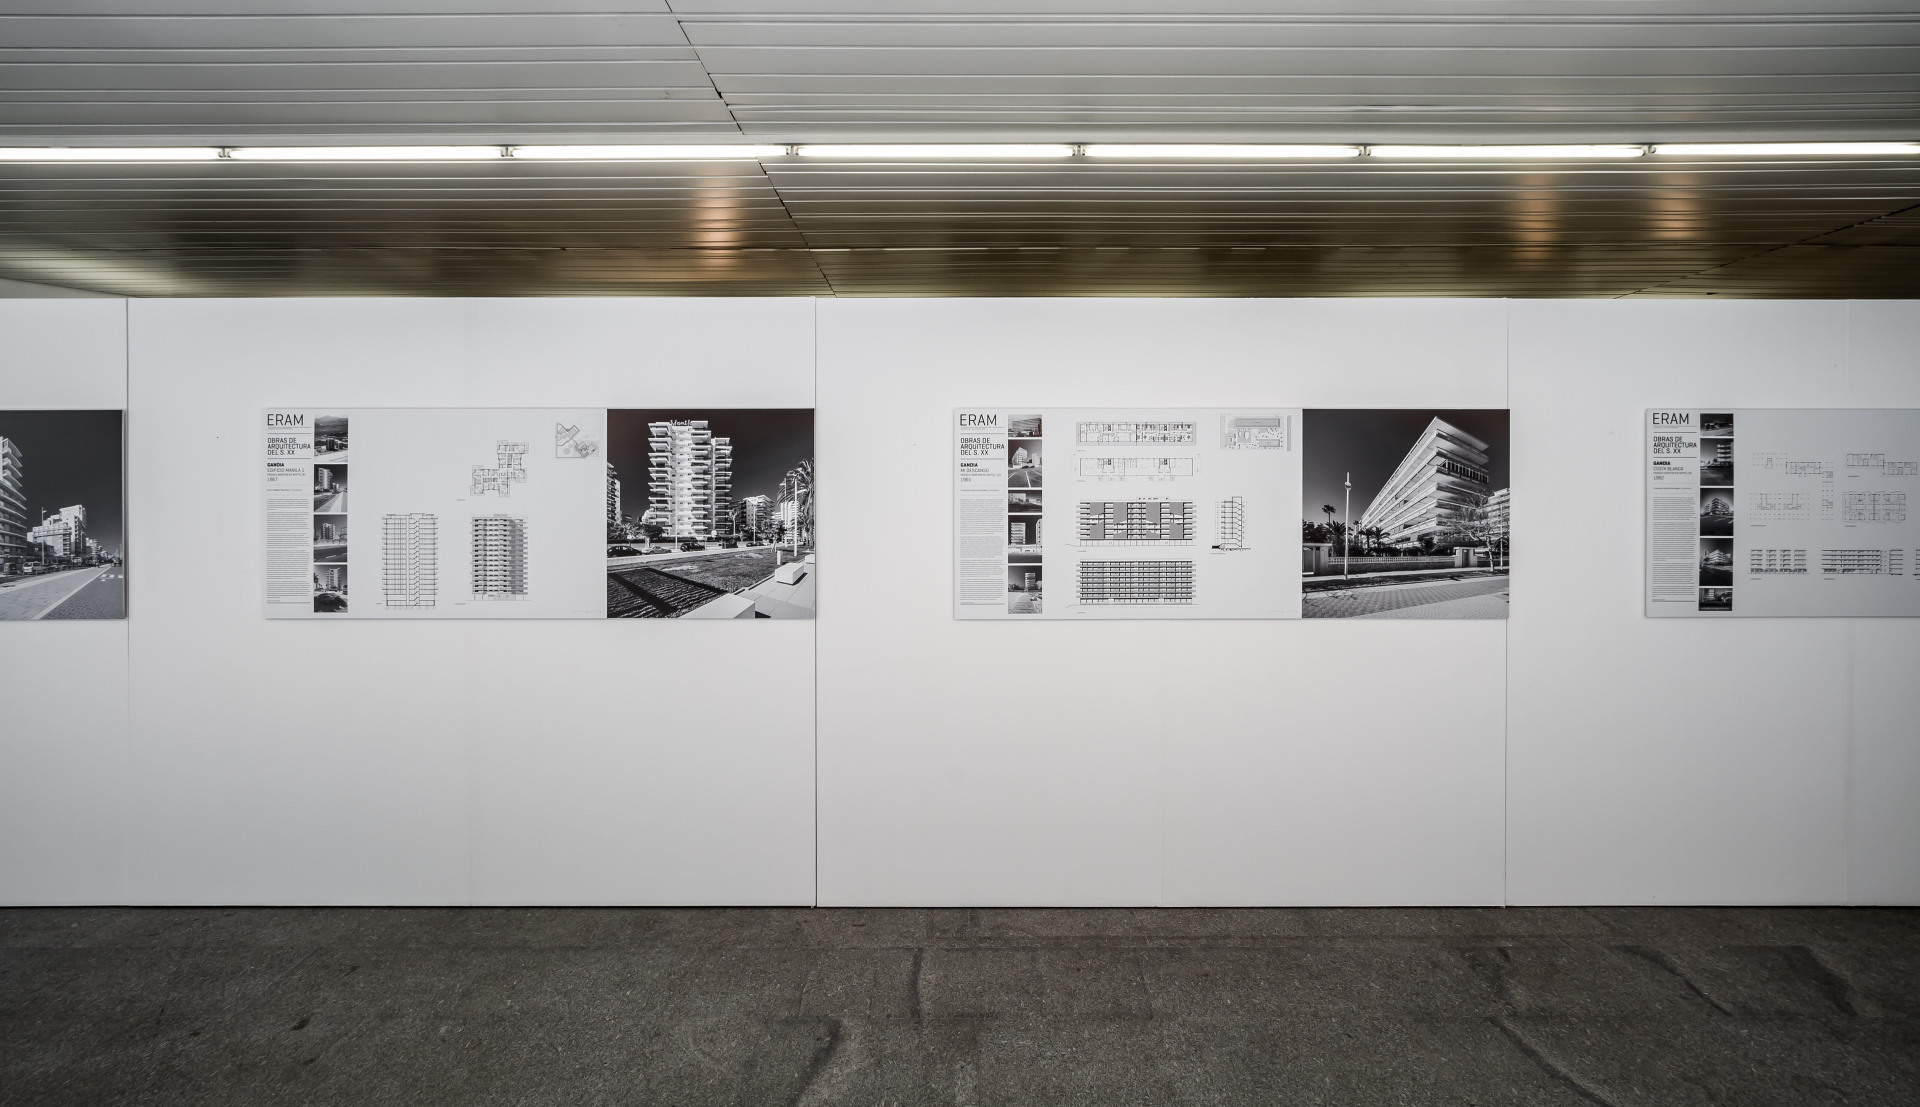 fotografia-arquitectura-valencia-german-cabo-upv-etsav-eram-exposicion (10)